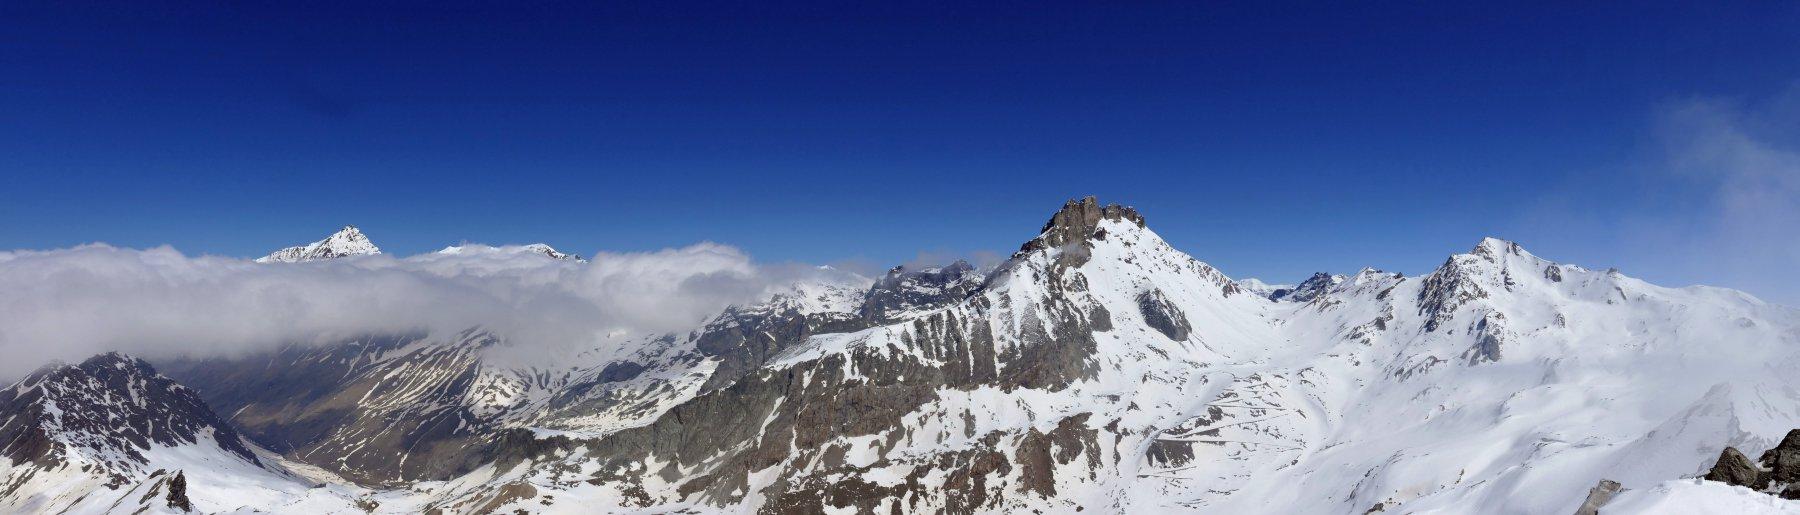 Panoramica dalla Punta d' Almiane